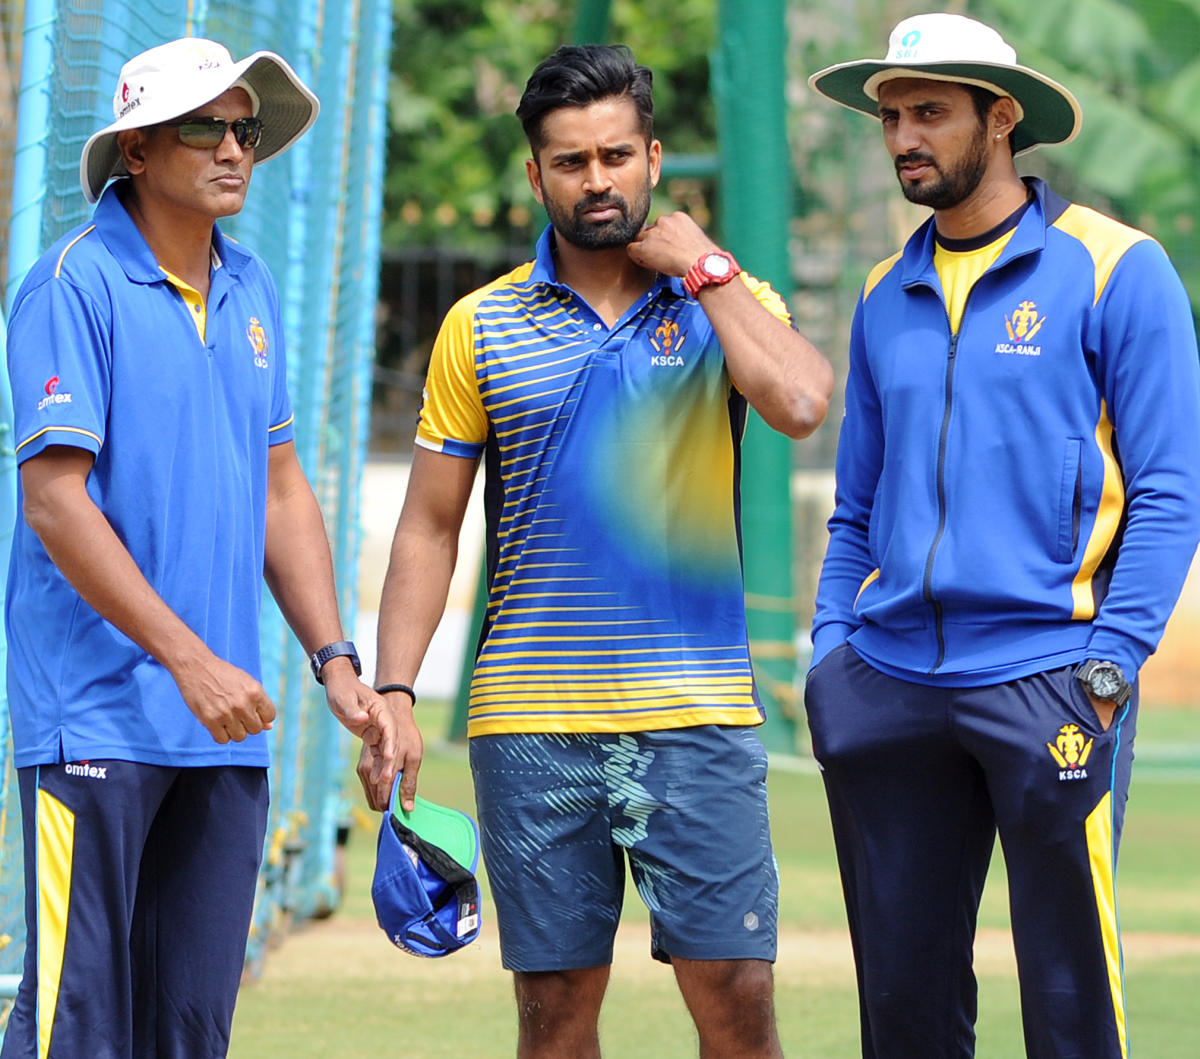 UPBEAT Karnataka batting coach Yere Goud (left) and skipper R Vinay Kumar will be hoping to kick-start the new season on a high. DH PHOTO/SRIKANTA SHARMA R